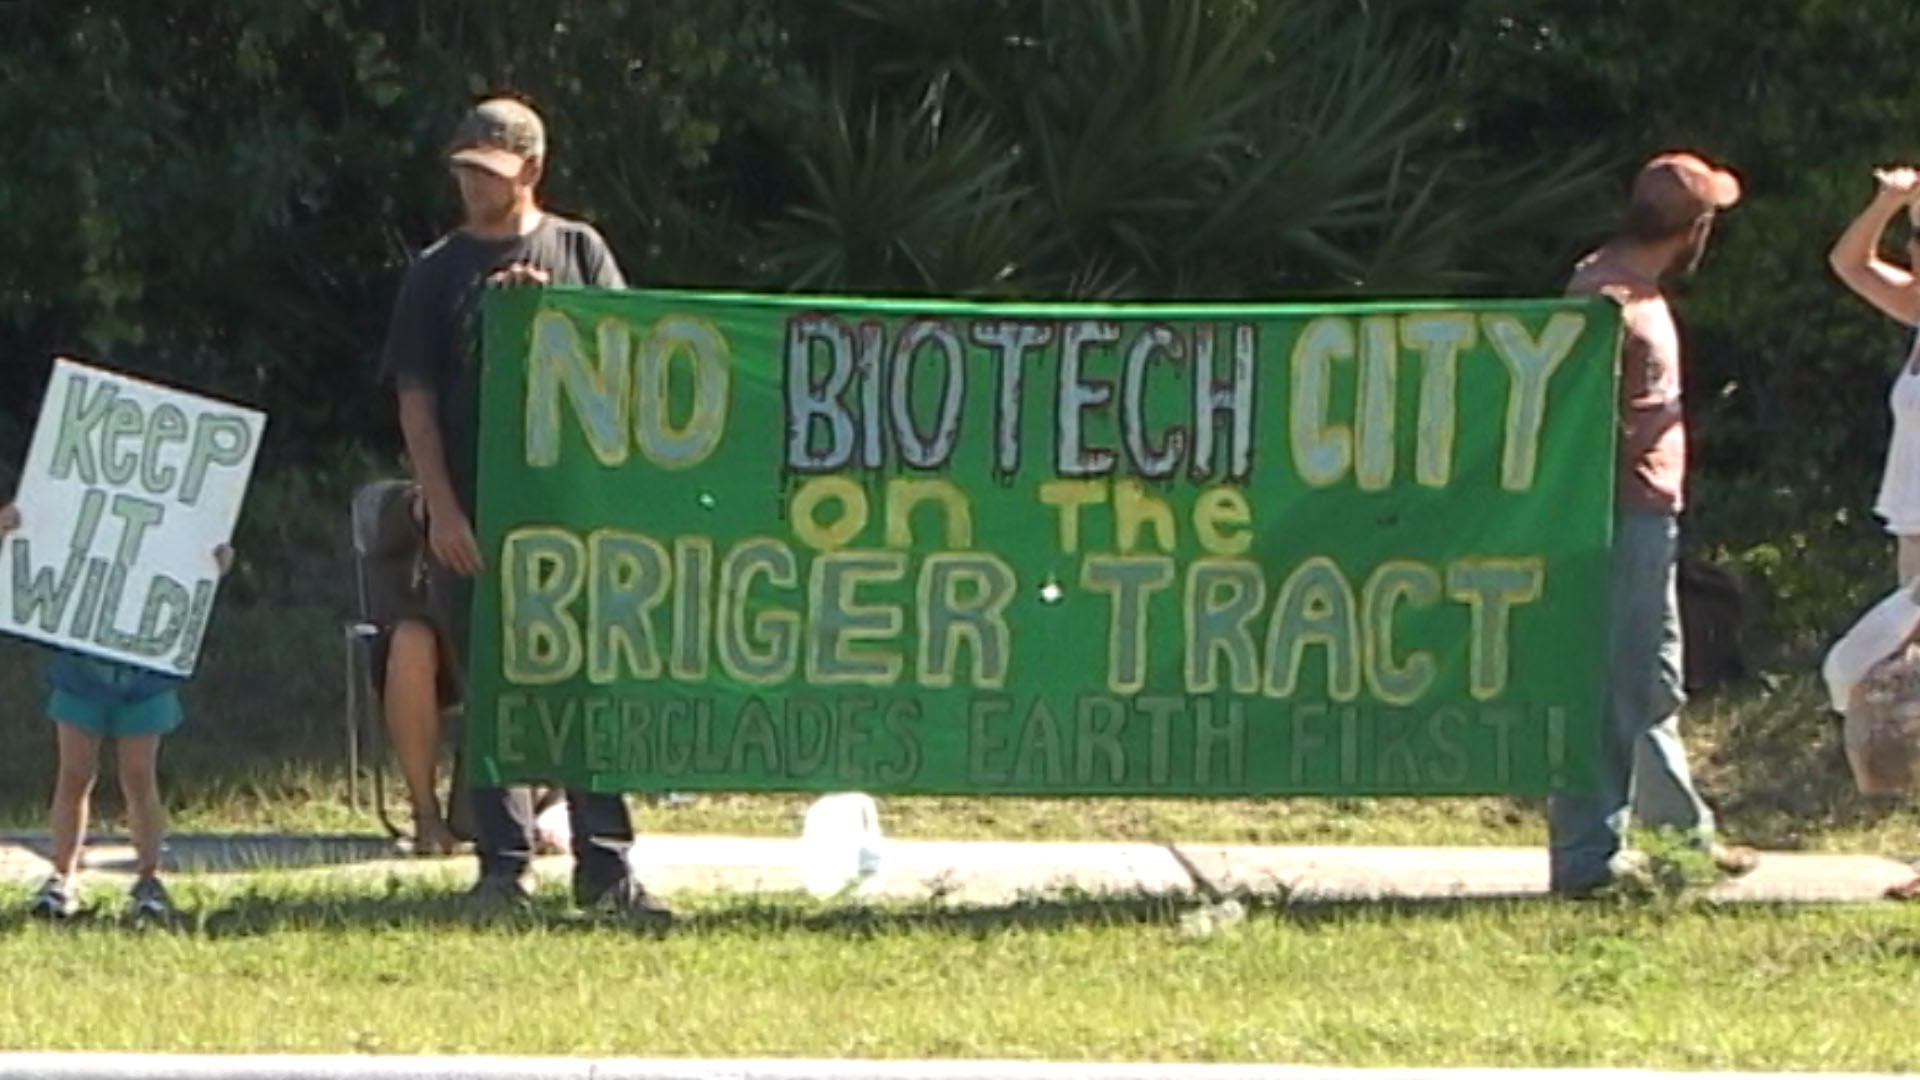 sign no biotech city.jpg